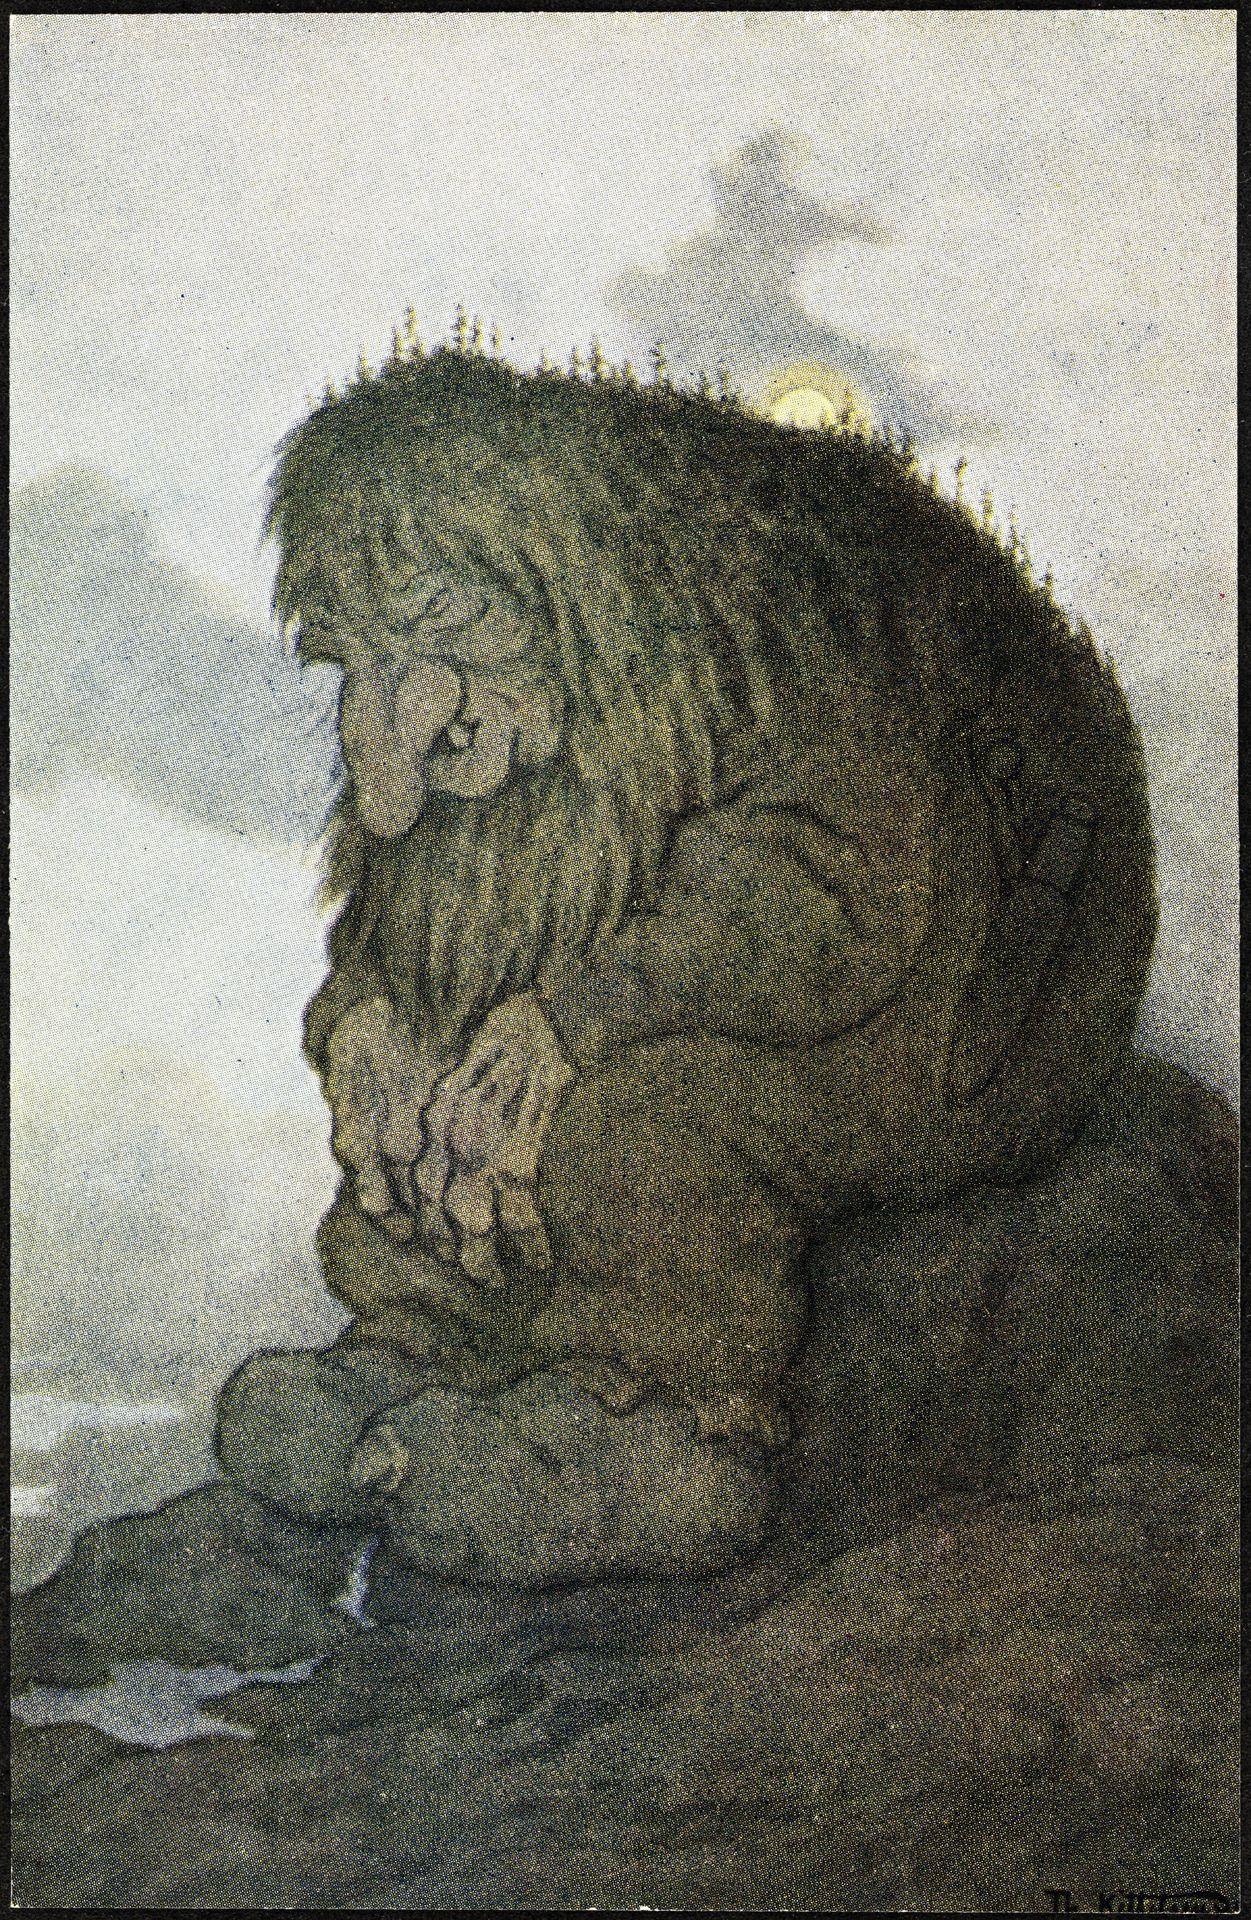 Trolls (folklore)